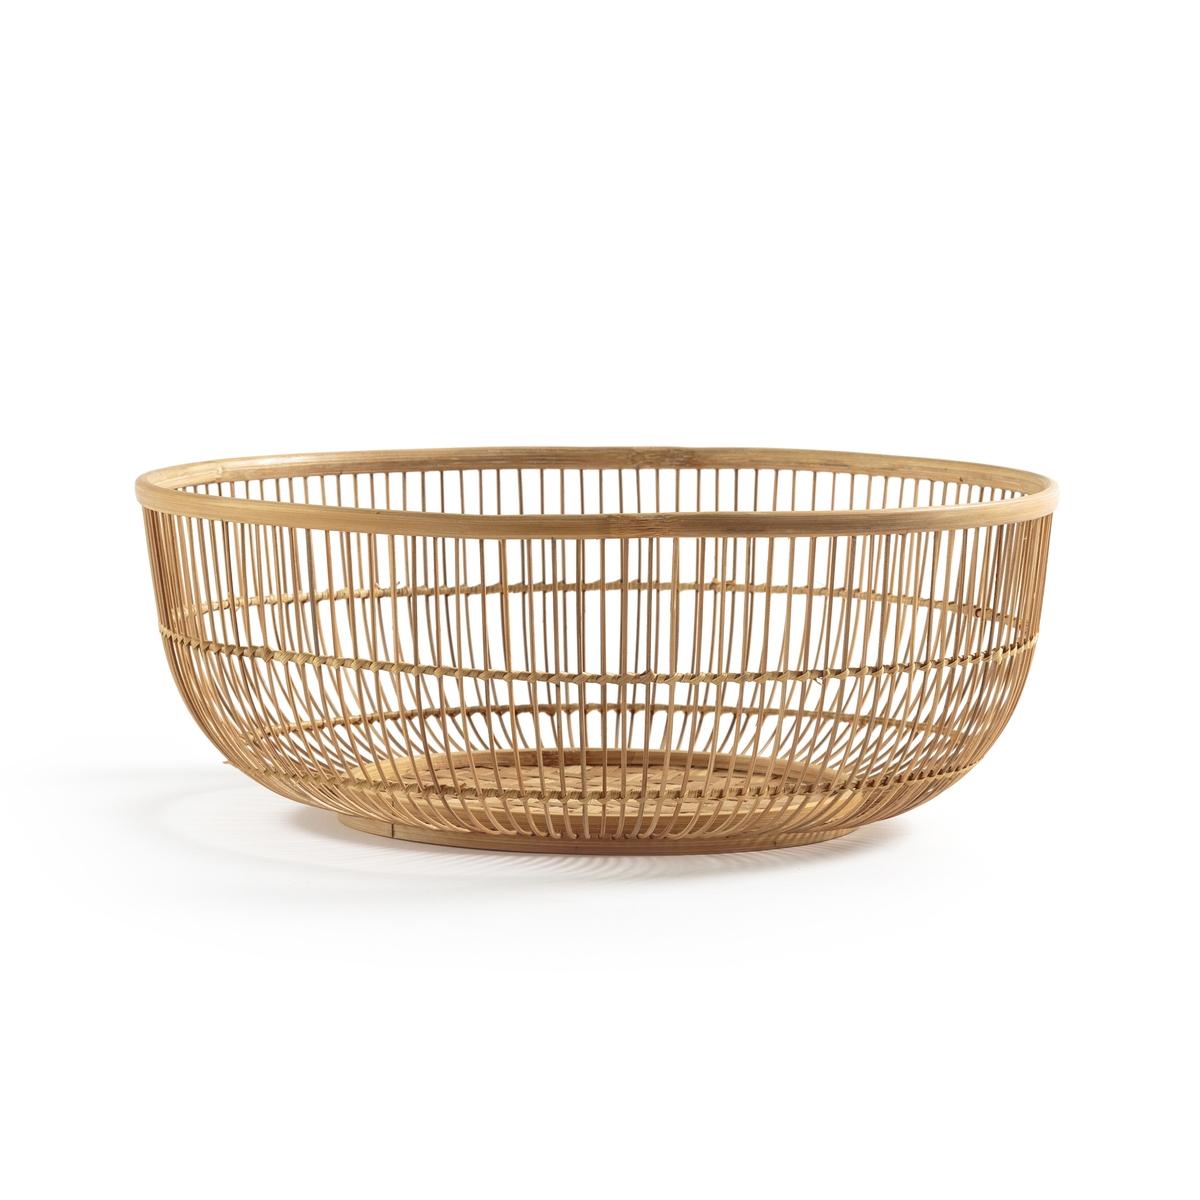 Корзина из бамбука, Ø35 см, Milise